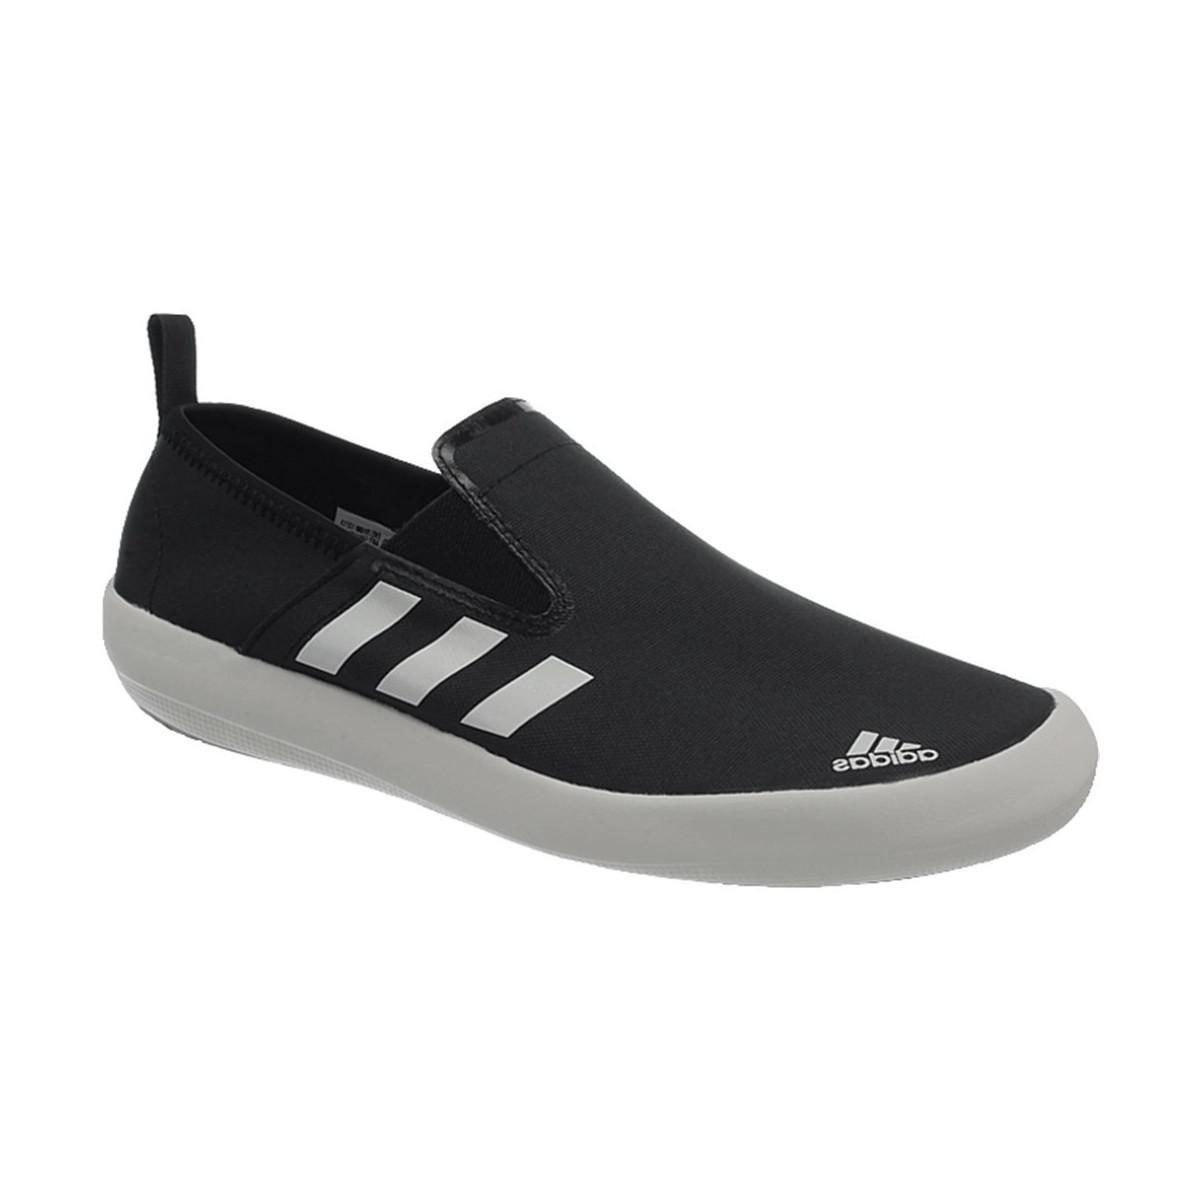 2bda2e81b adidas Boat Slipon Deluxe Men s Slip-ons (shoes) In White in White ...